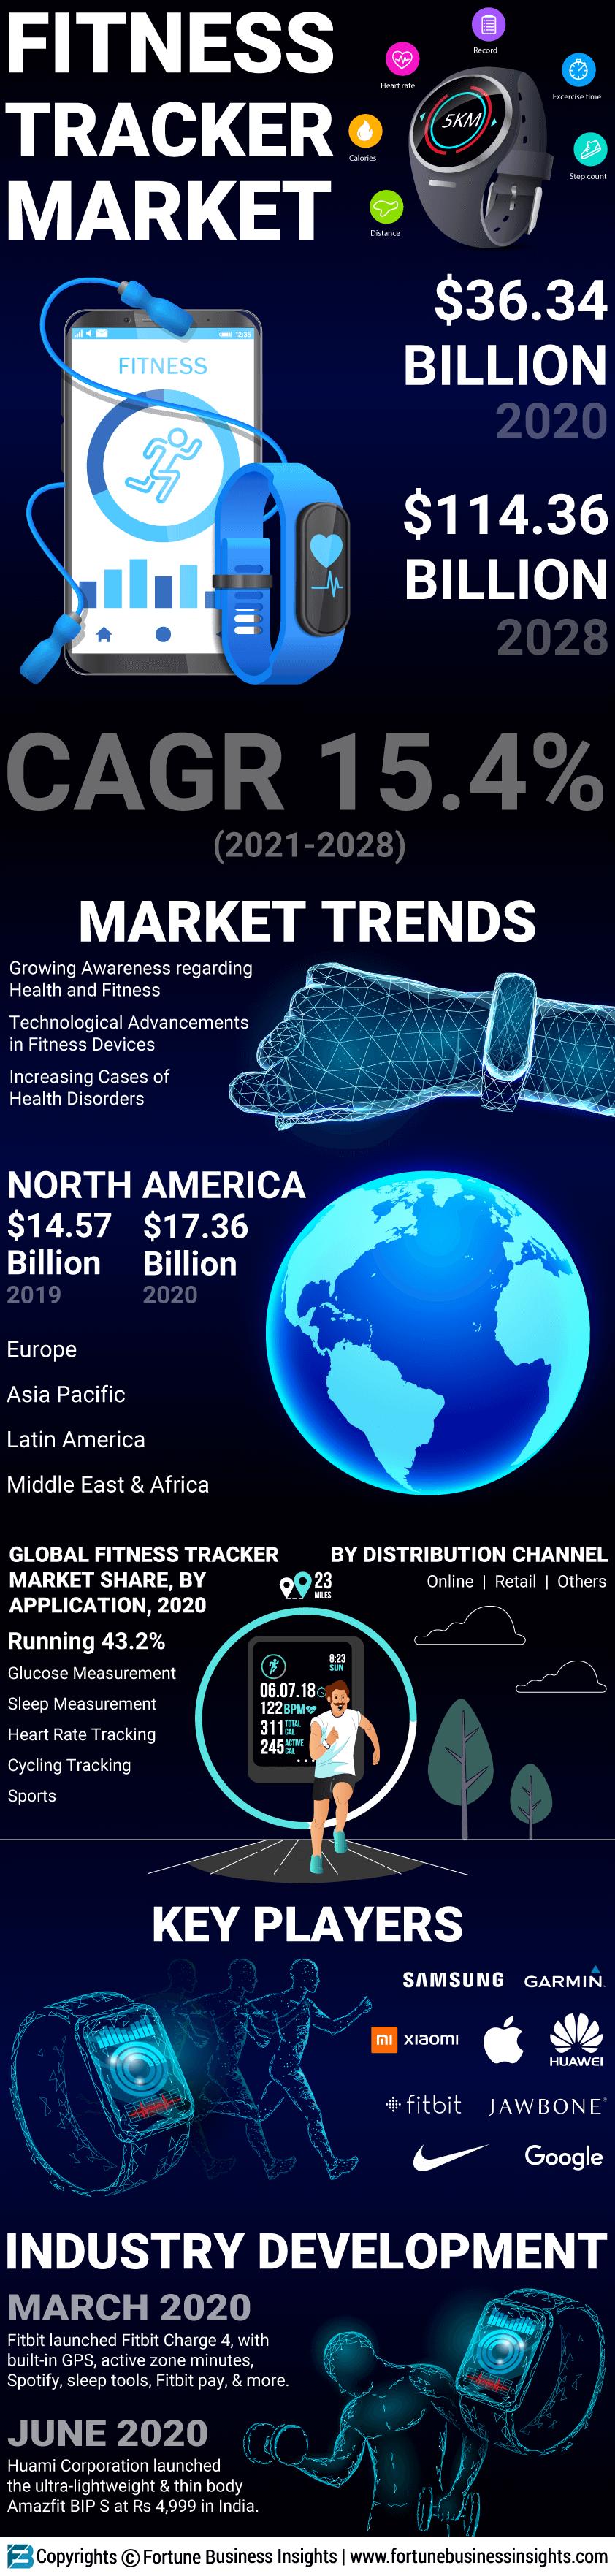 Fitness Tracker Market